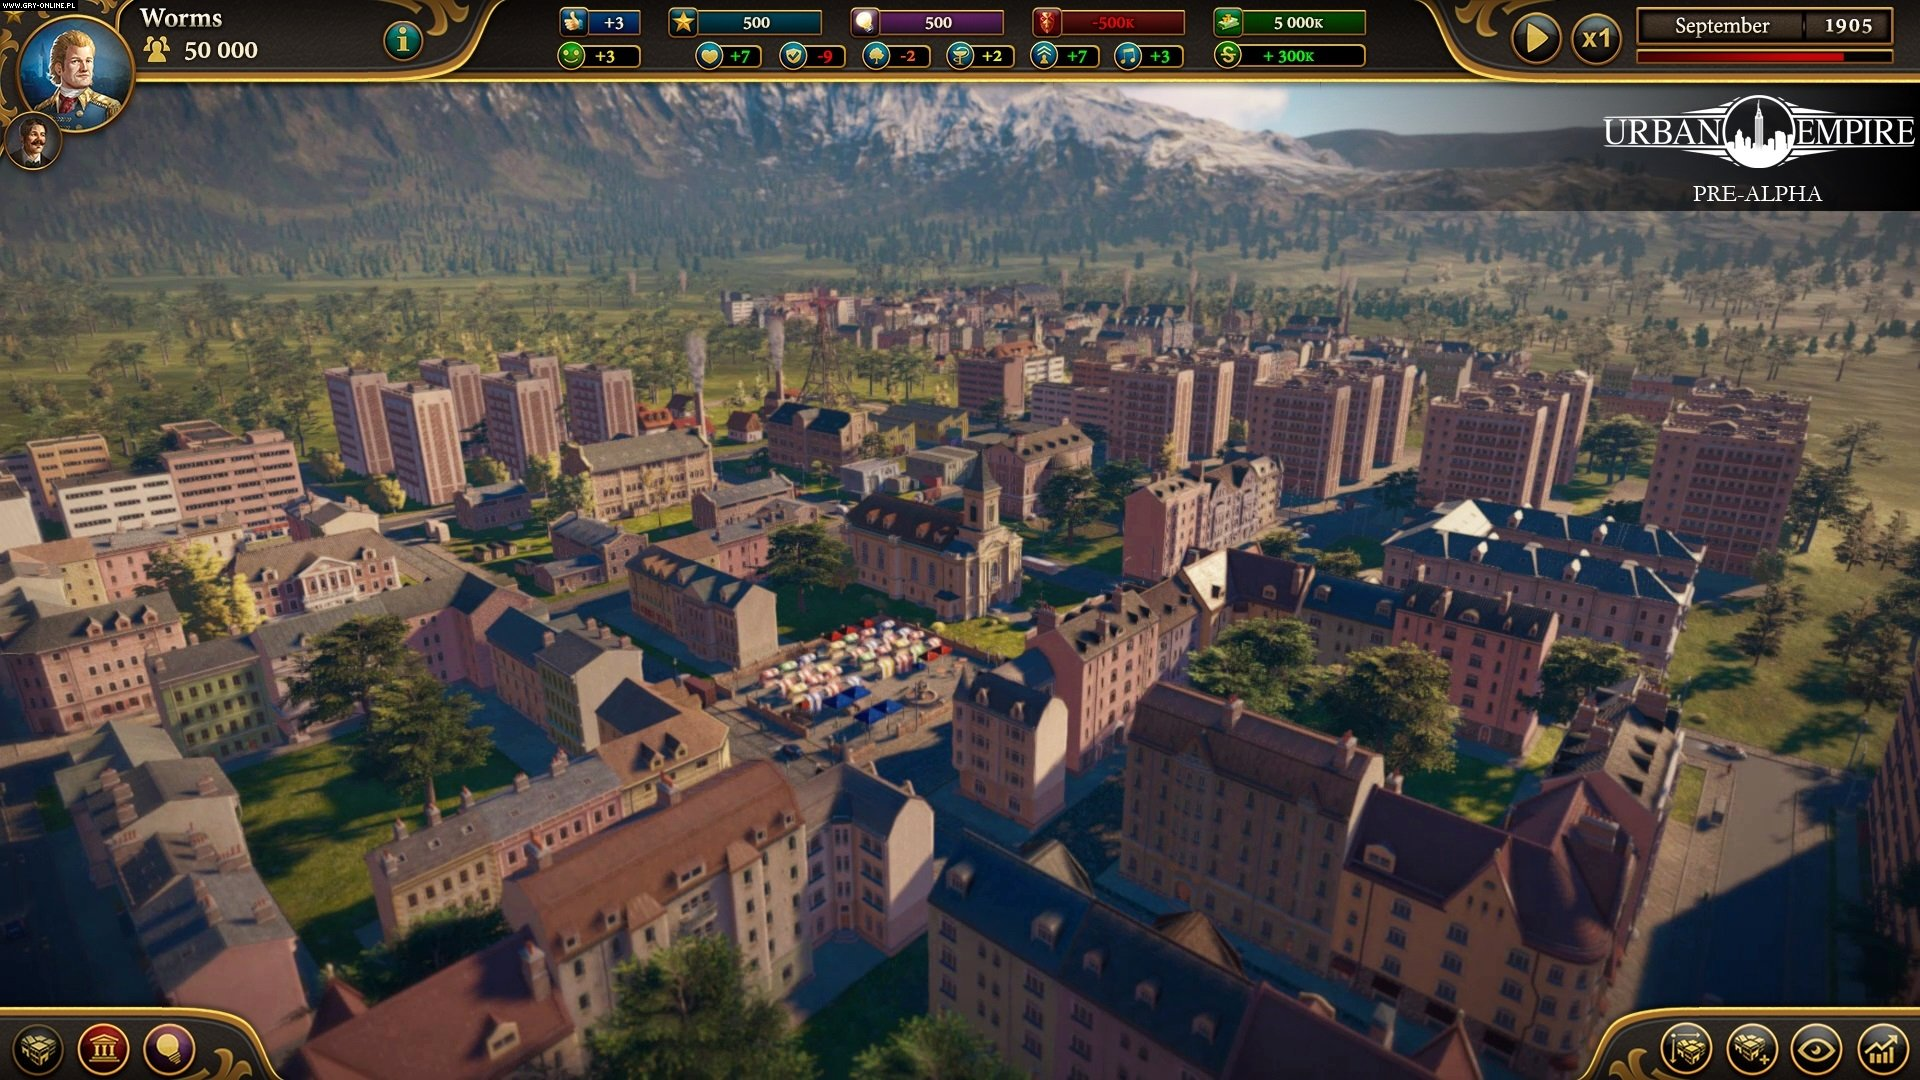 Urban Empire PC Gry Screen 6/6, Reborn Games, Kalypso Media